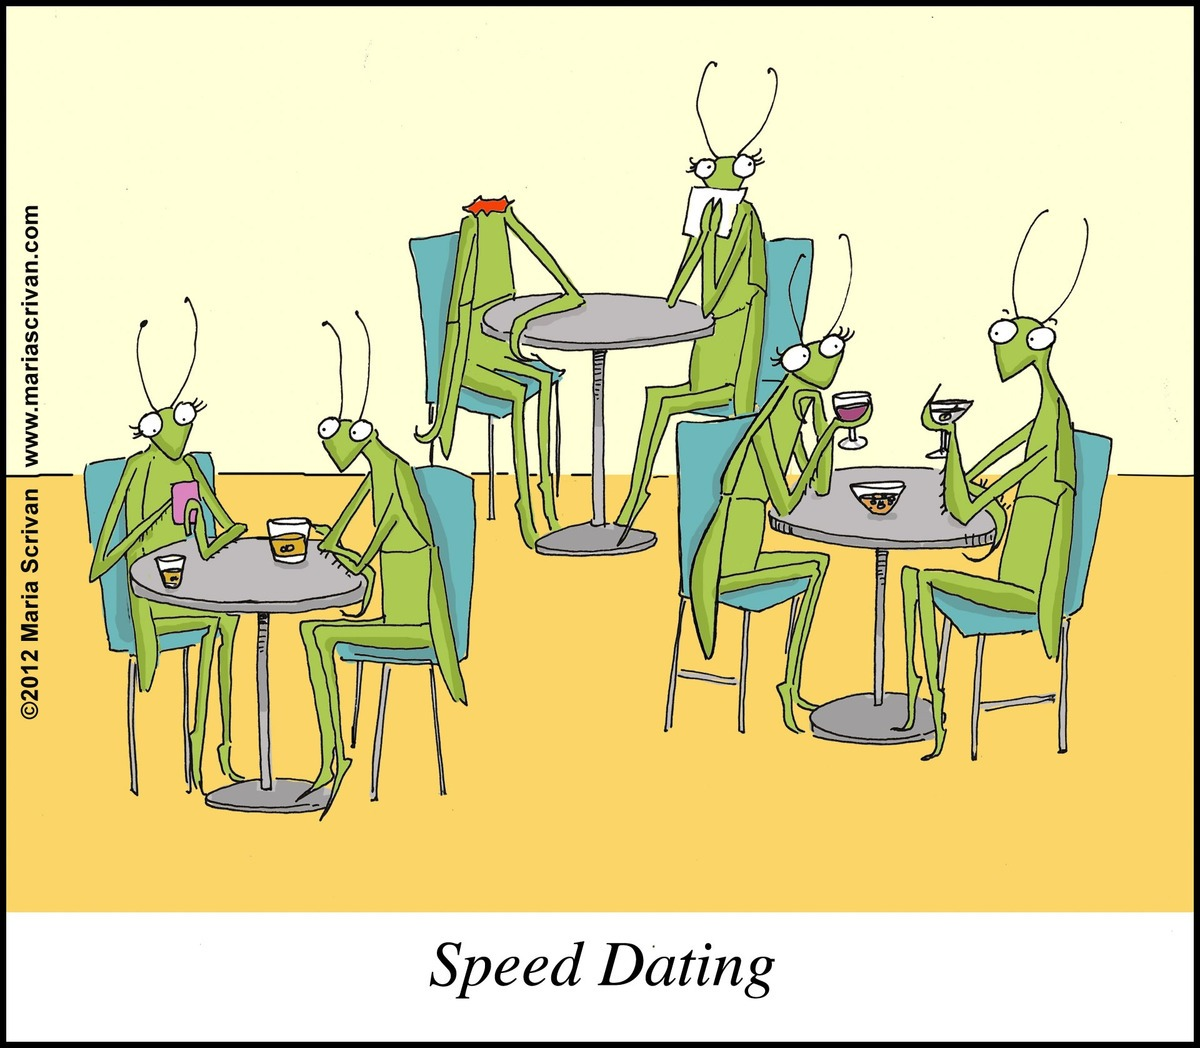 Ons Widowed Speed Dating Keeled